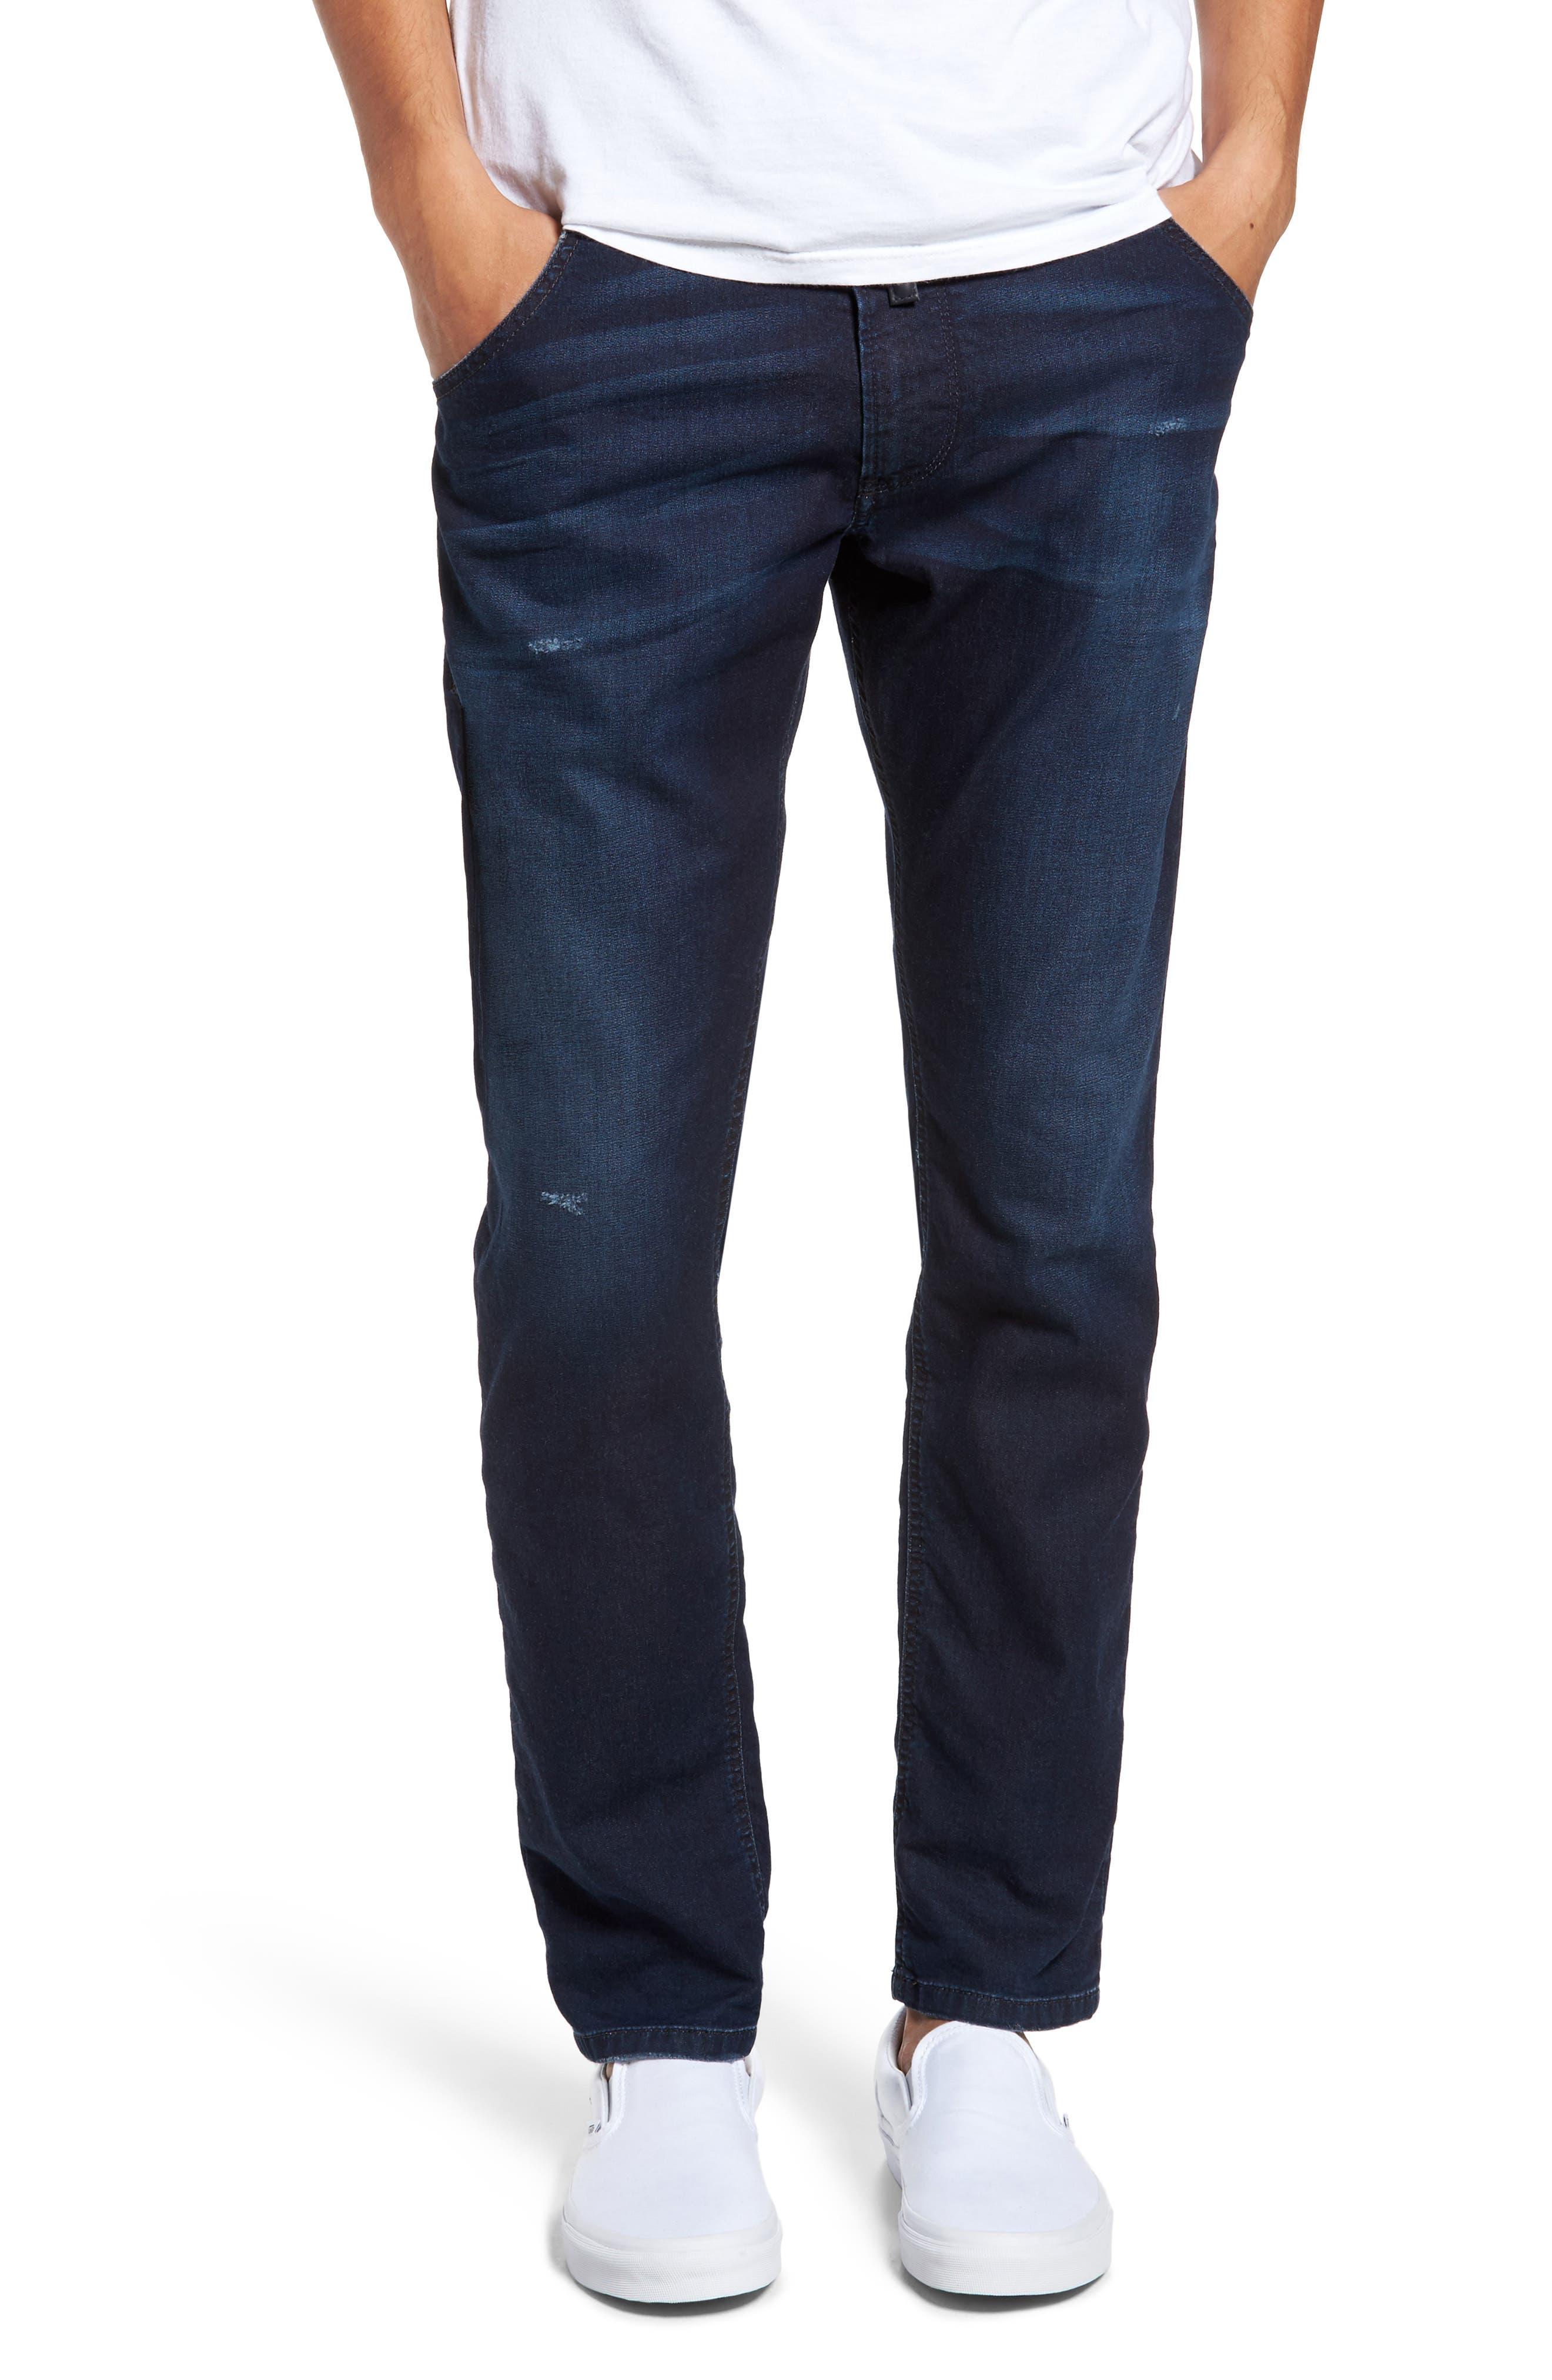 Krooley Slouchy Skinny Jeans,                         Main,                         color, Denim